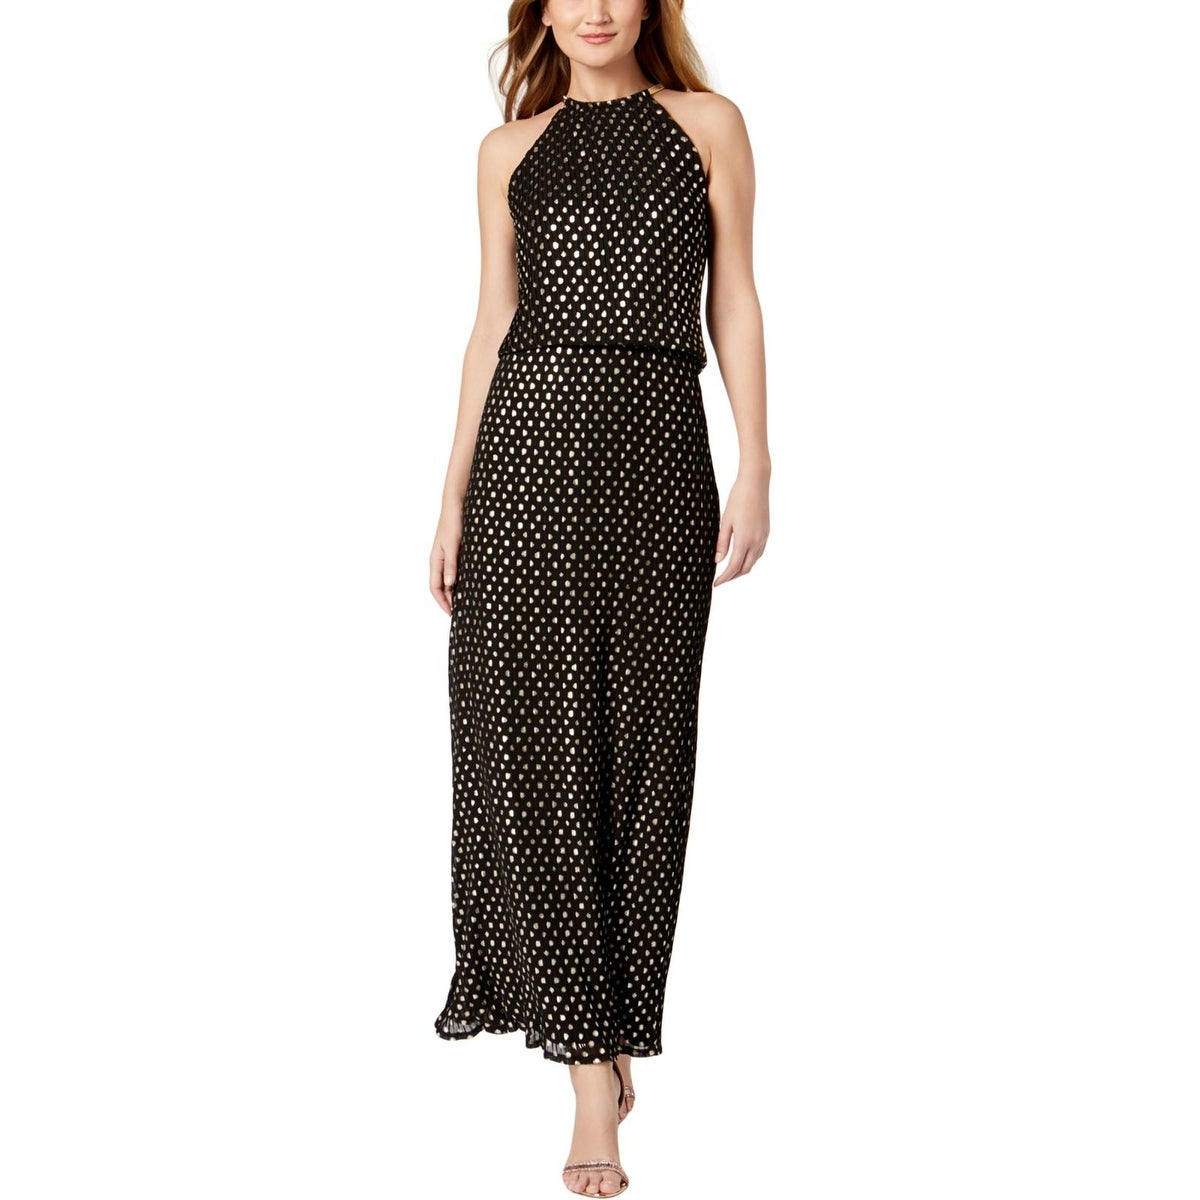 dec6e23e3898 Shop MSK Womens Maxi Dress Metallic Blouson - Free Shipping On ...